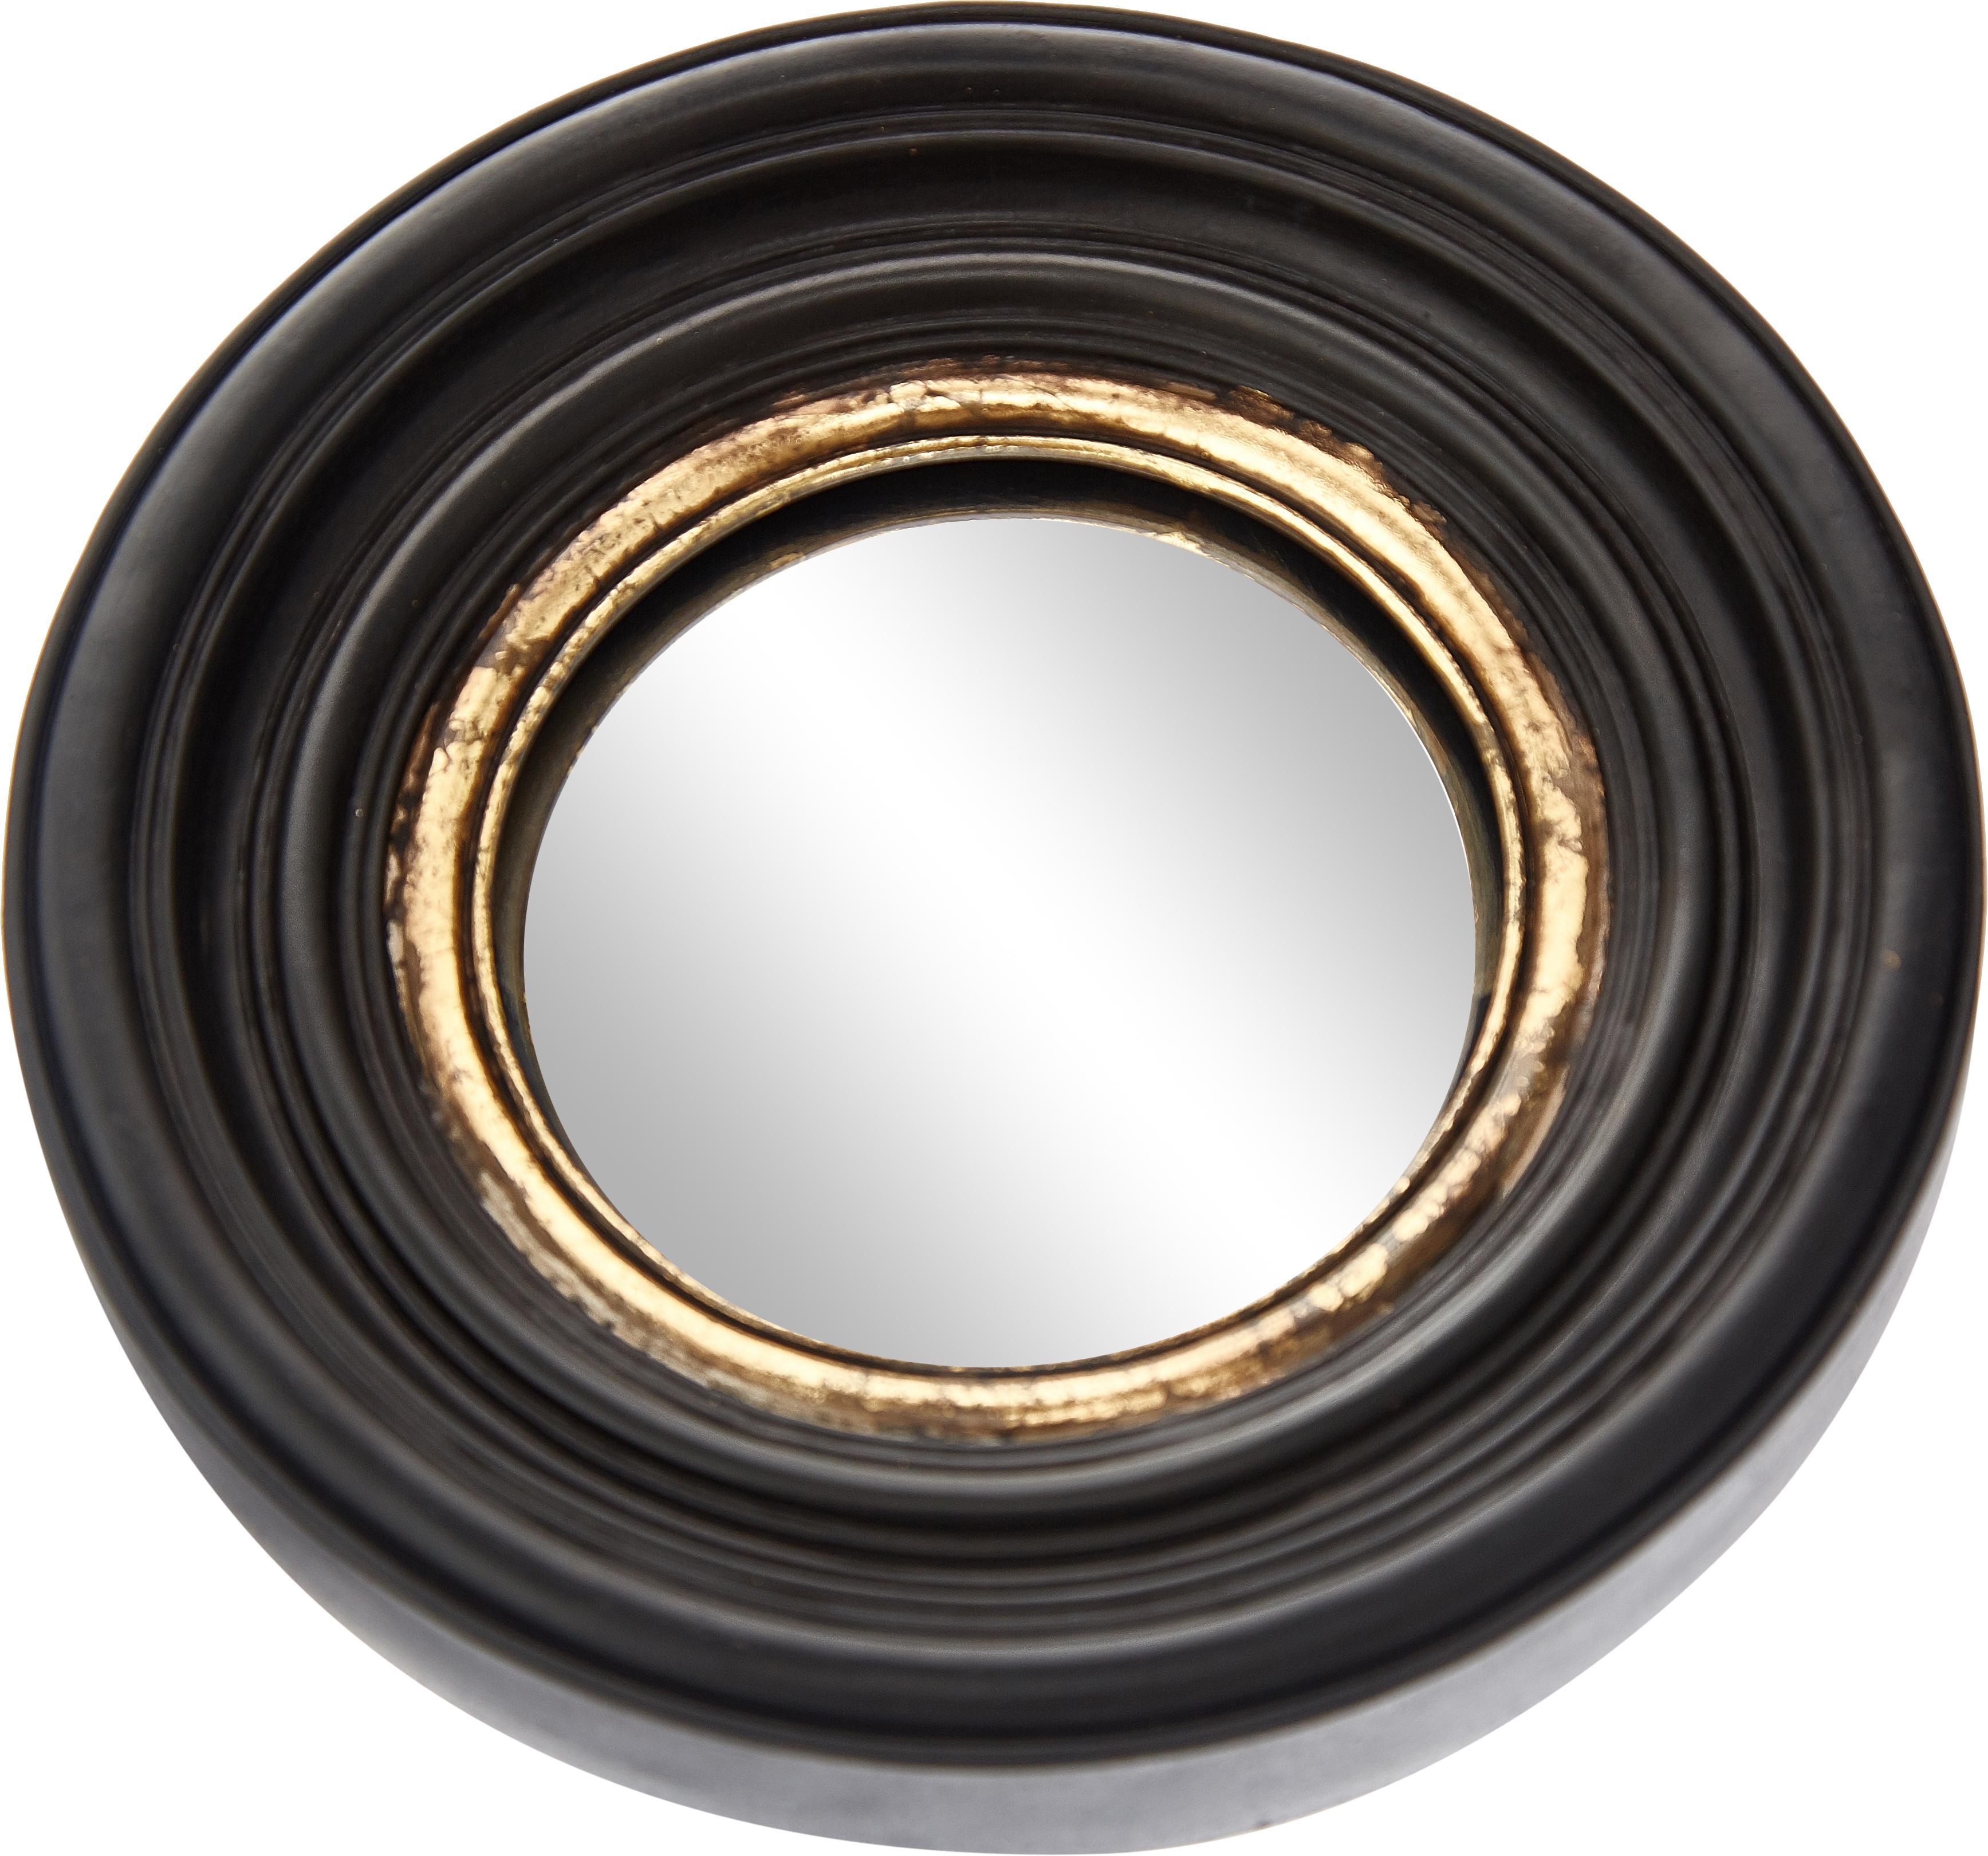 Ronde wandspiegel Resi met gebogen spiegelvlak, Frame: polyresin, Zwart, goudkleurig, Ø 26 cm